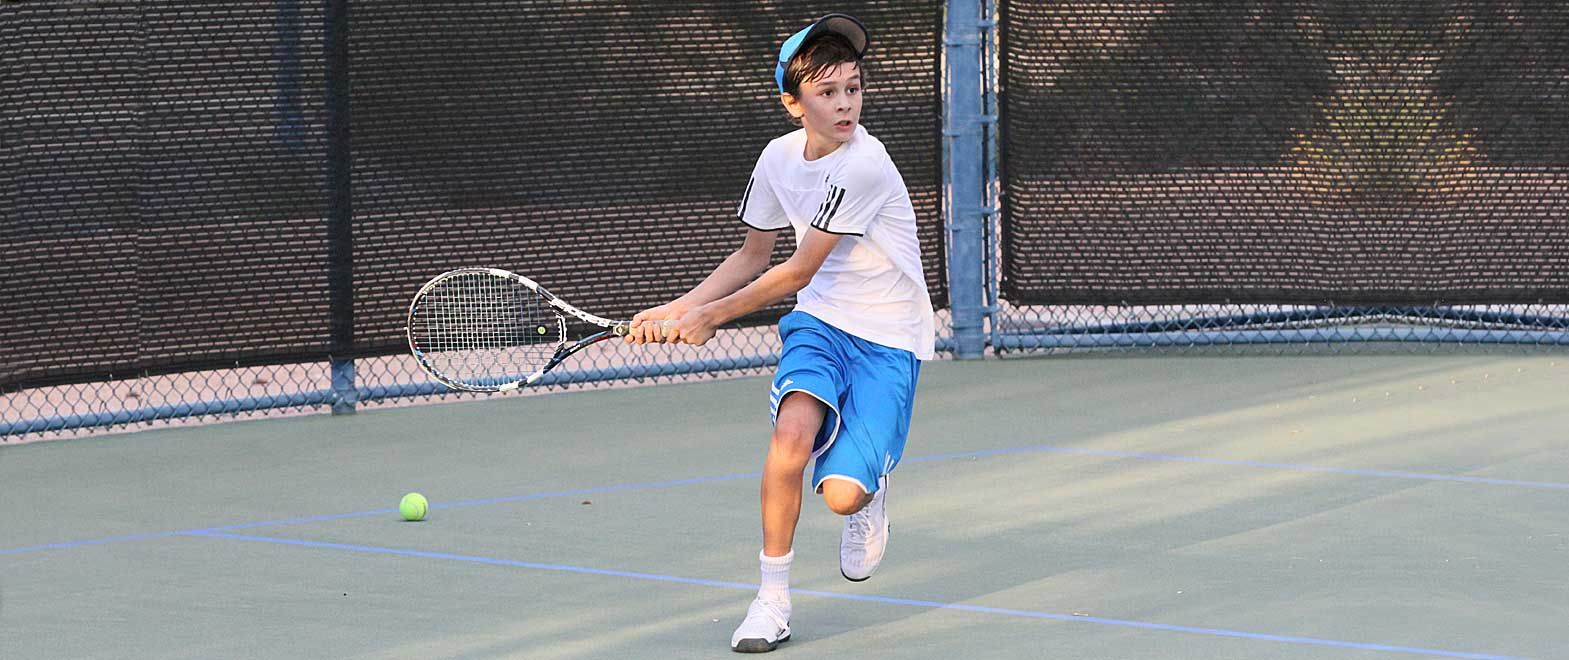 Darling tennis center las vegas tennis center summer